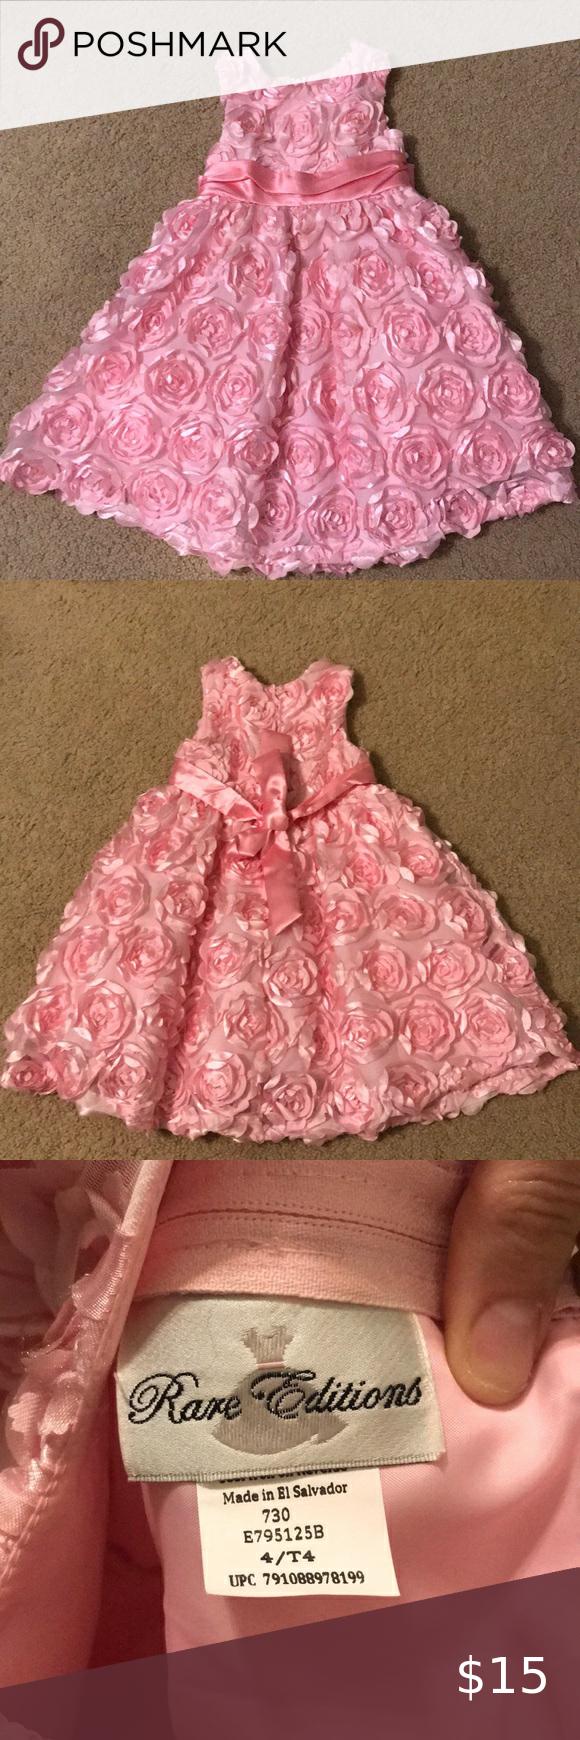 Pink Rosebud Dress 4t In 2020 Girls Pink Dress Rosebud Dress Rare Editions Dress [ 1740 x 580 Pixel ]